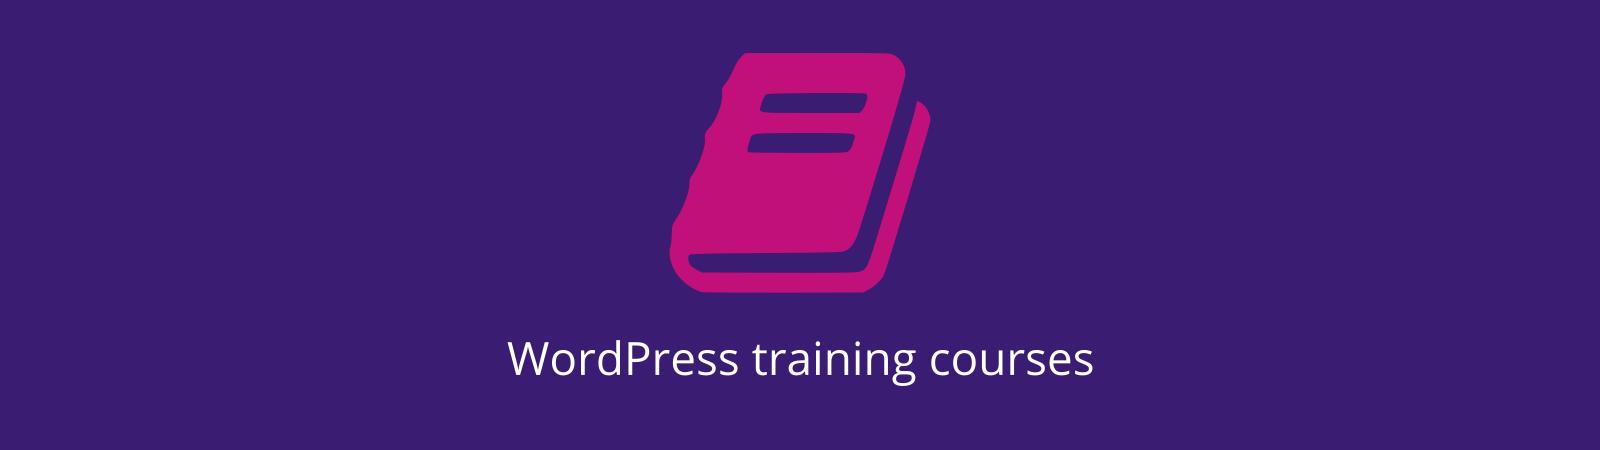 WordPress training courses in the UK